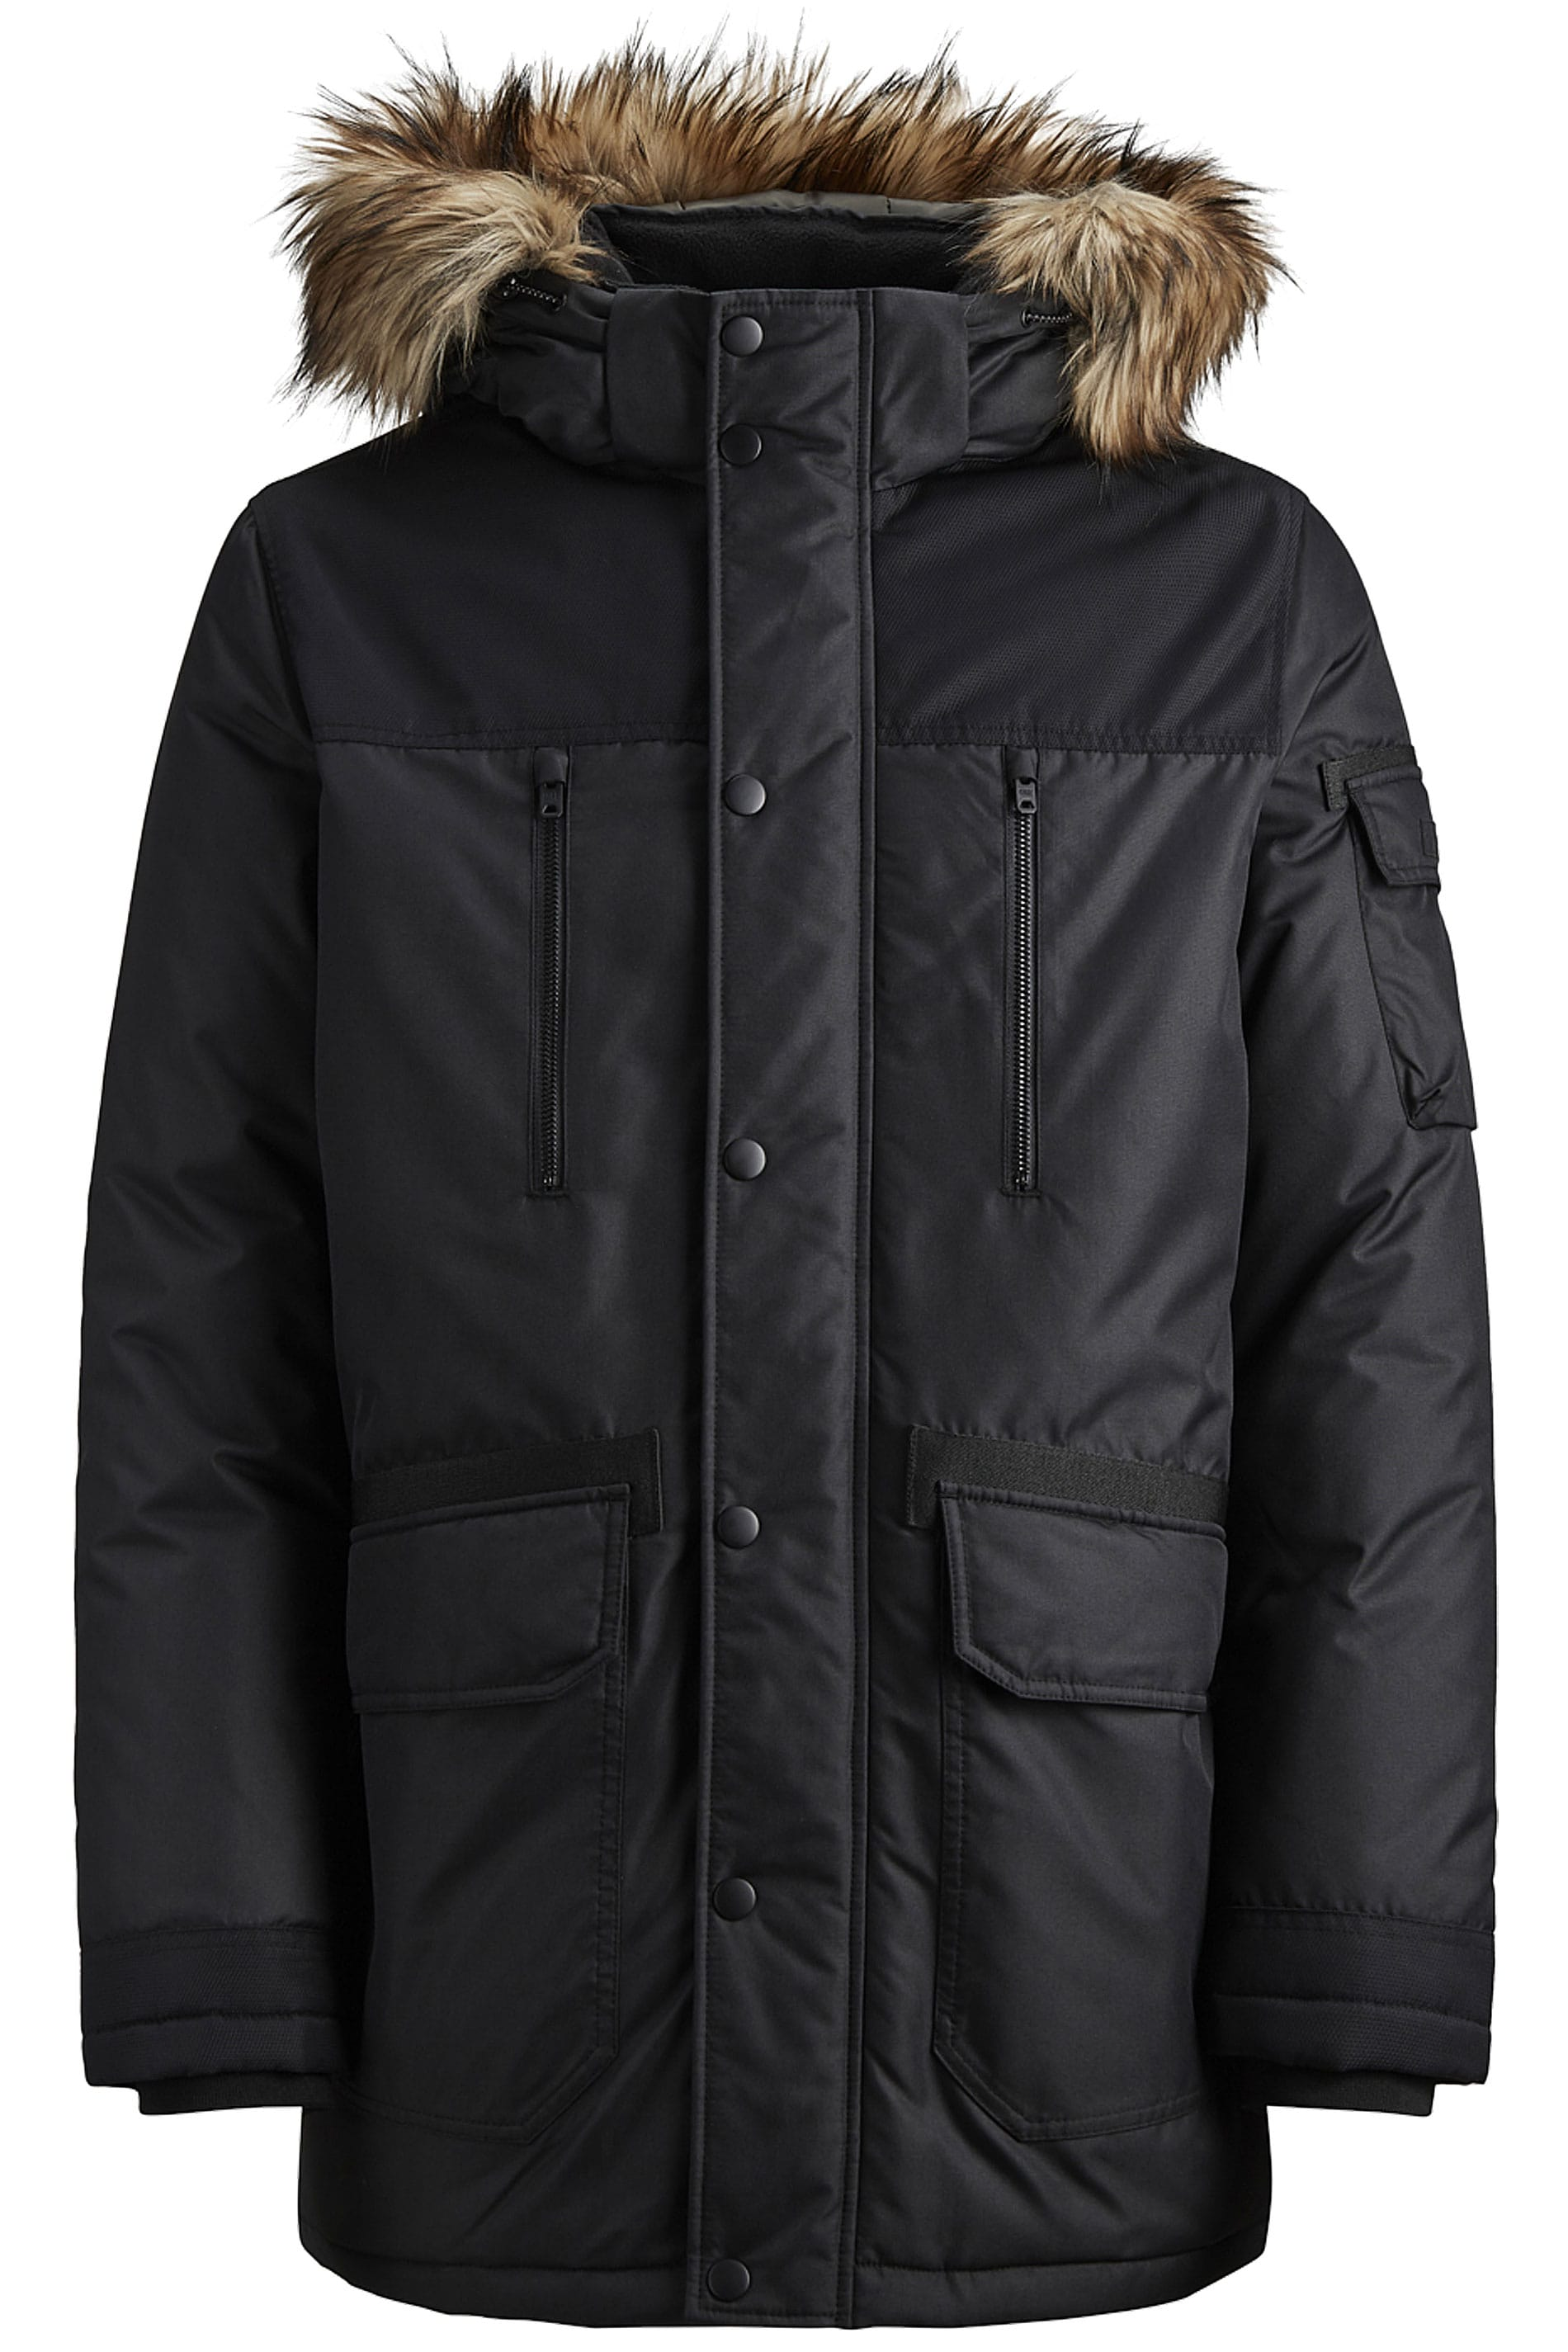 JACK & JONES Black Faux Fur Parka Coat